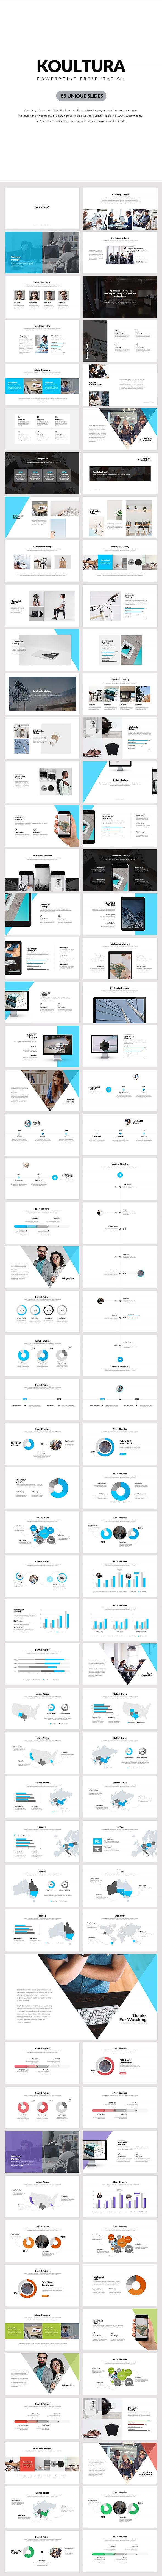 Koultura Keynote Presentation - Business Keynote Templates